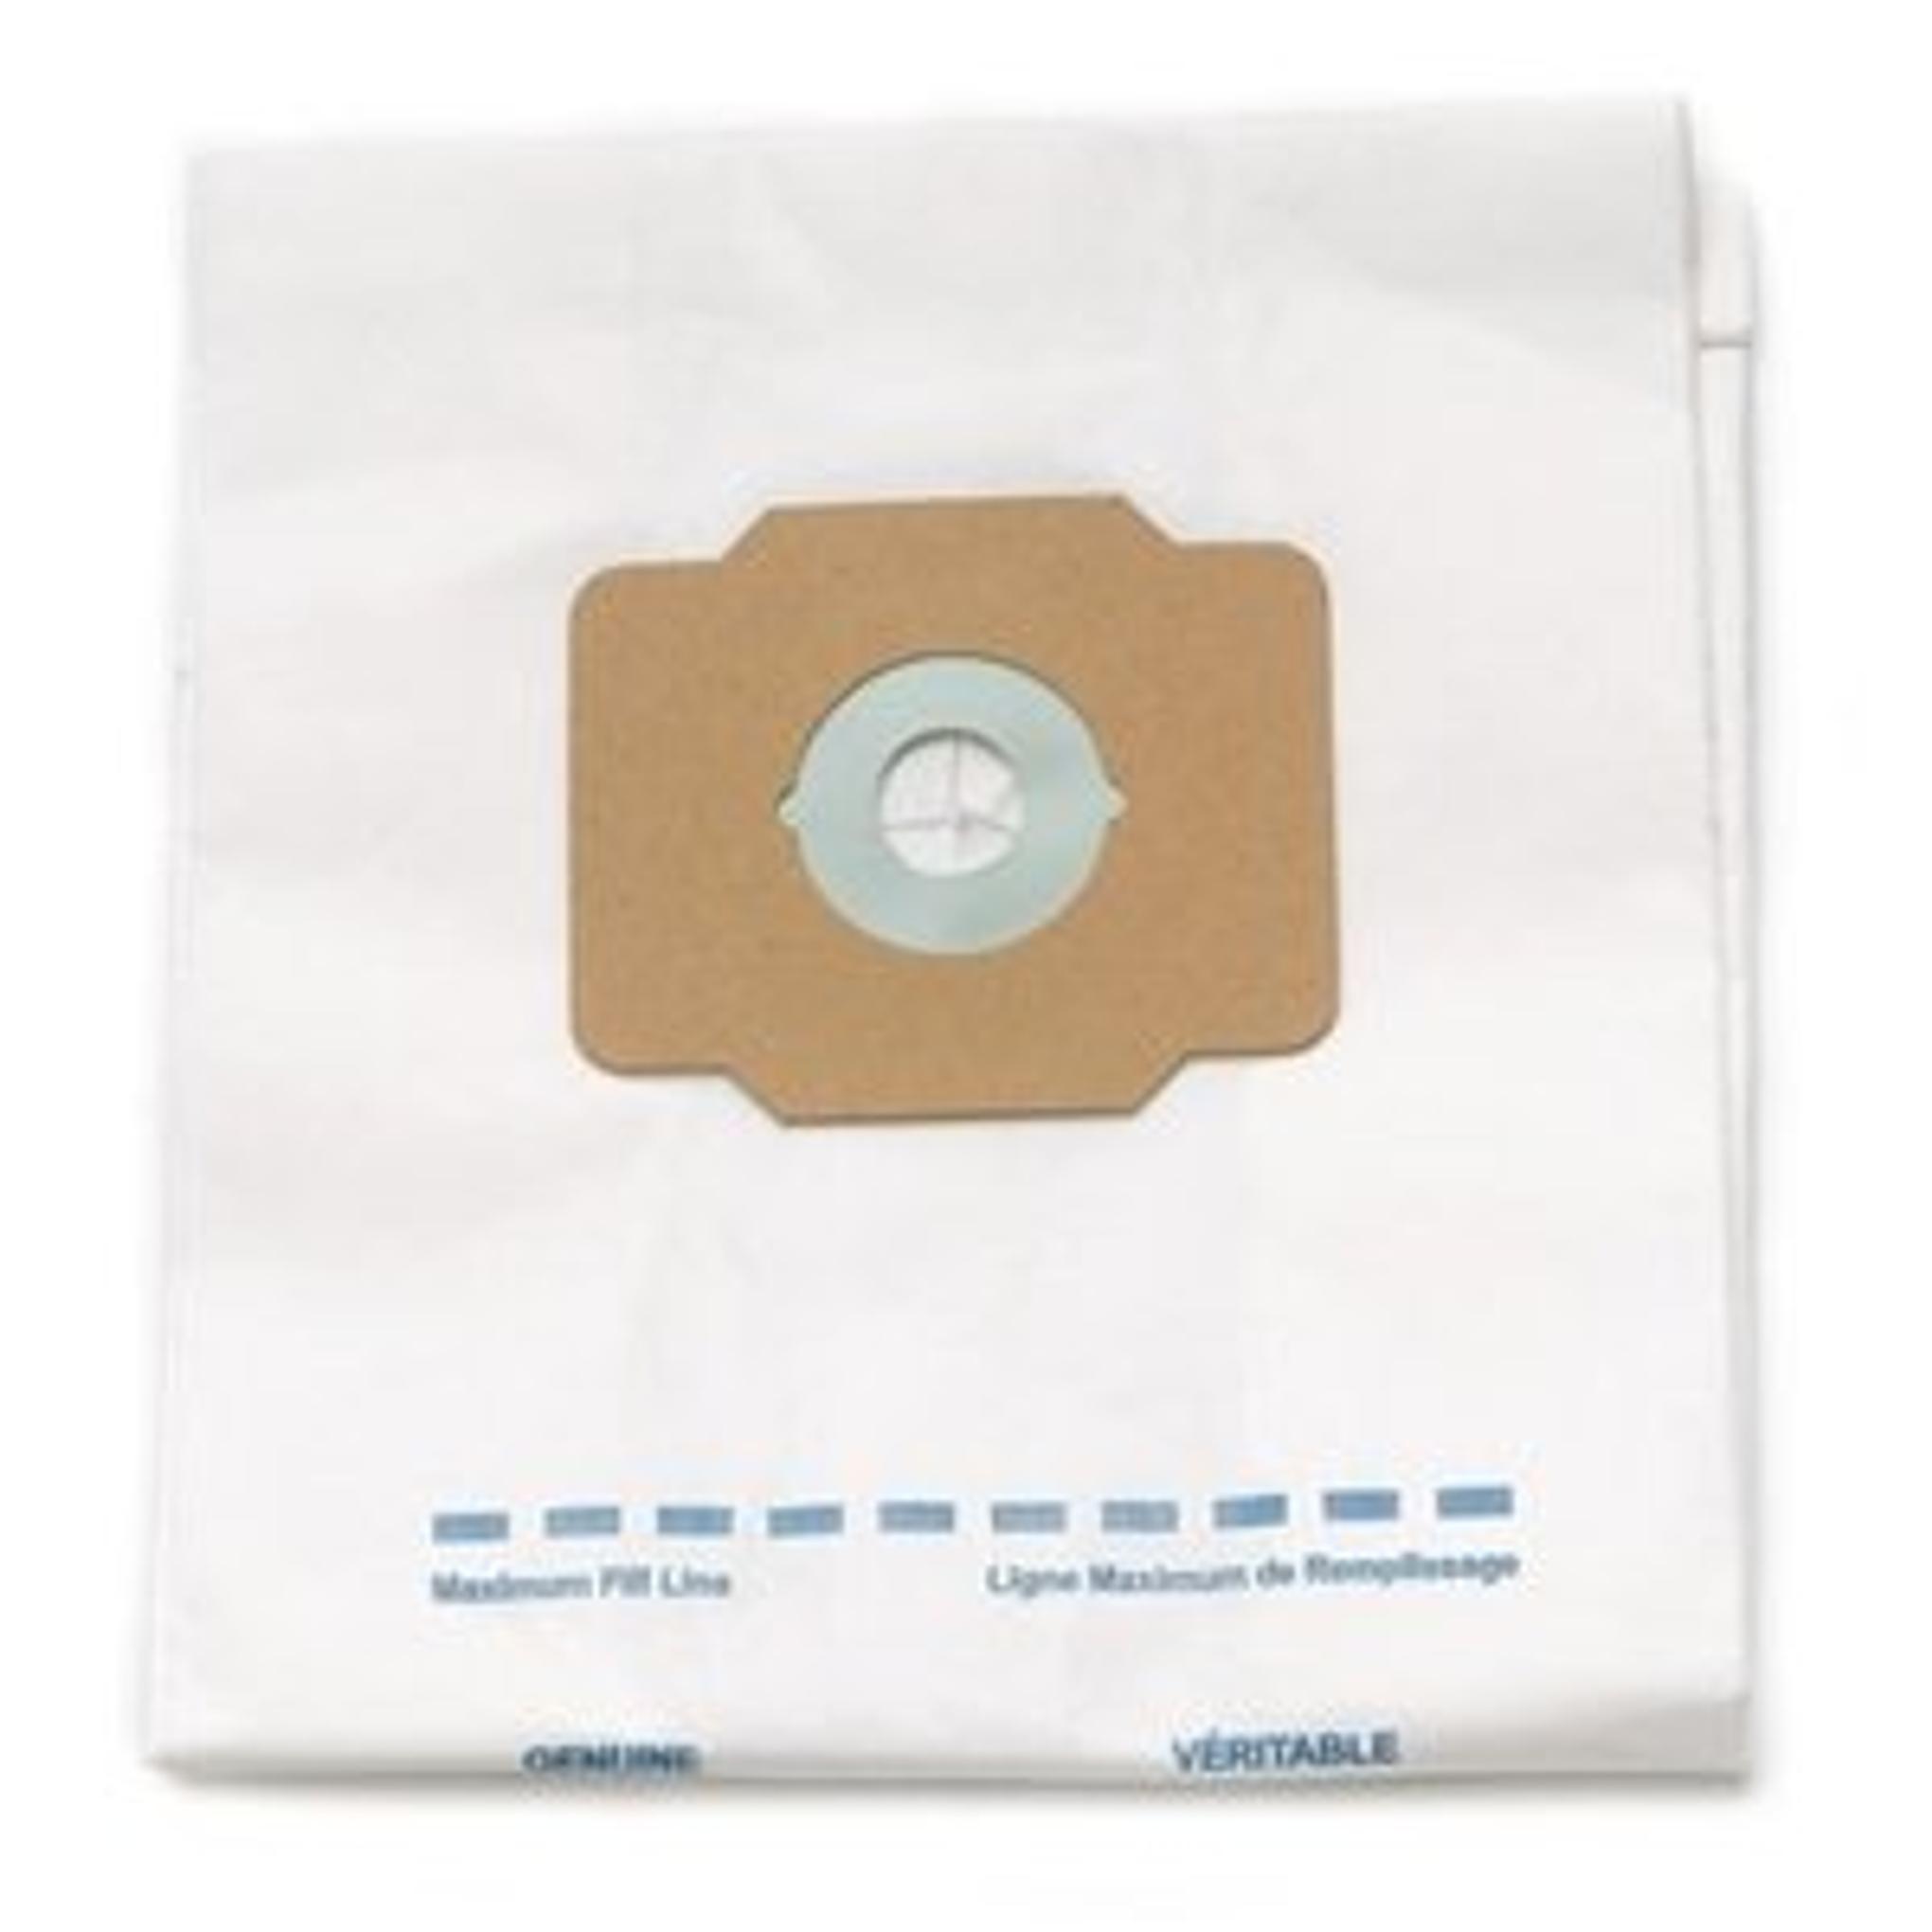 Beam Genuine Filter bags 3 pk to suit BM165, Z262, Z bin units